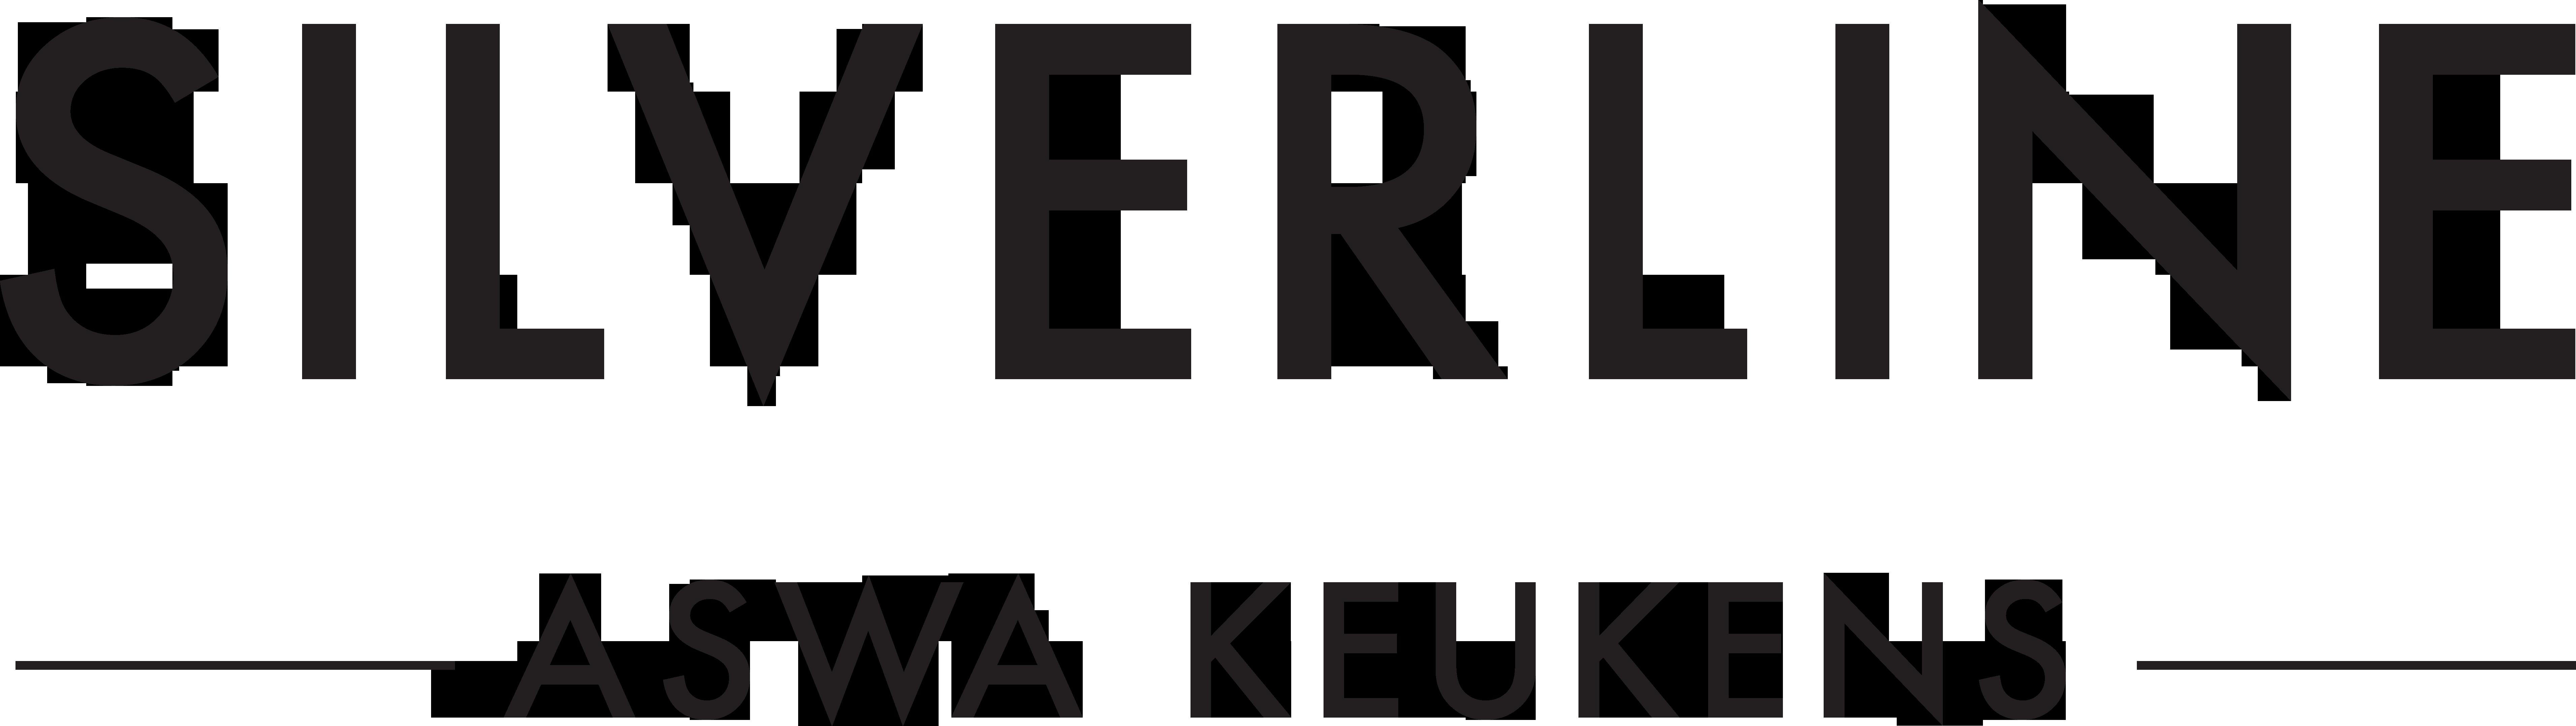 Silverline-aswakeukens-logo-bkopie